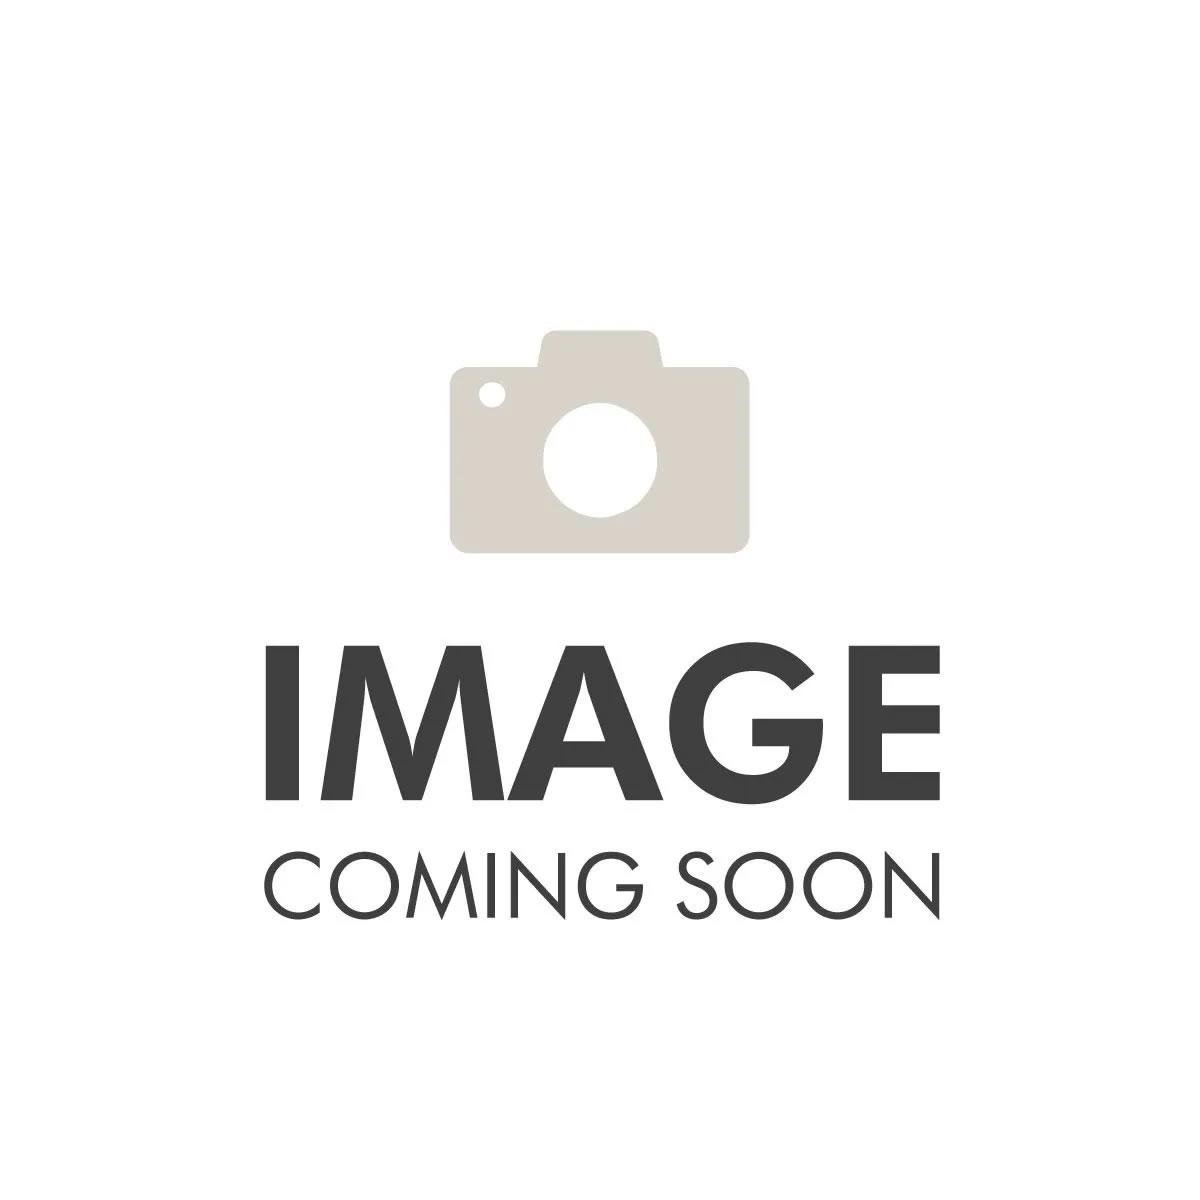 Front Bumper Applique, Silver; 07-17 Jeep Wrangler JK